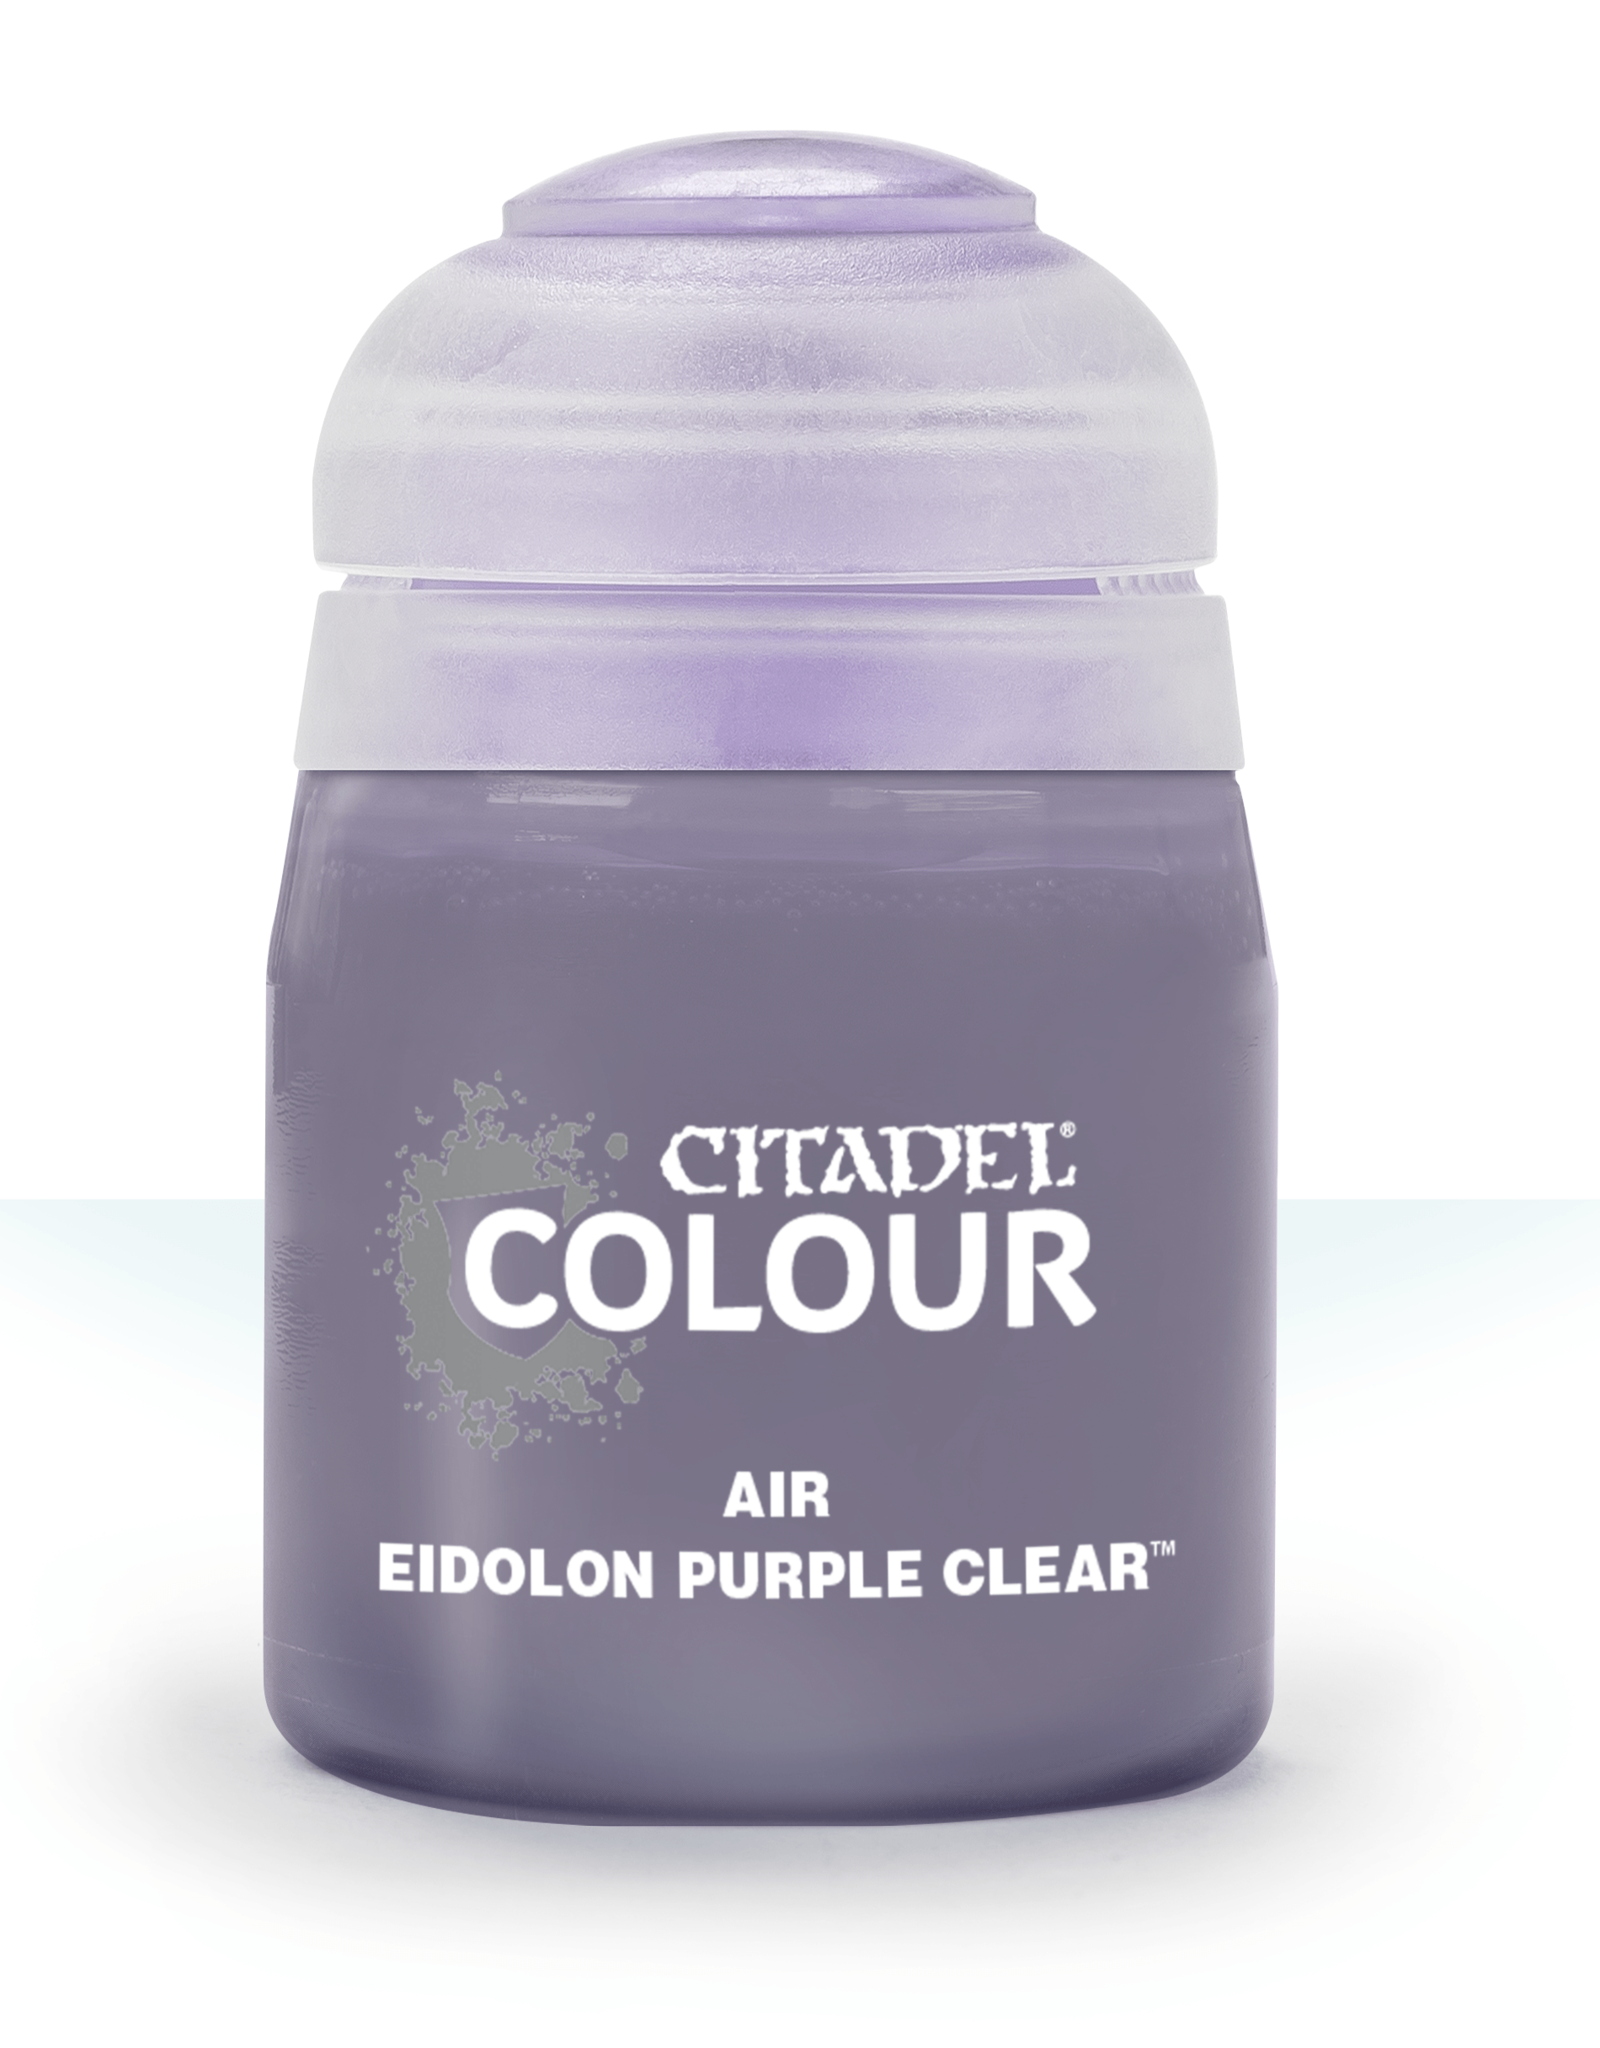 Citadel Citadel Air: Eidolon Purple Clear (24ml)